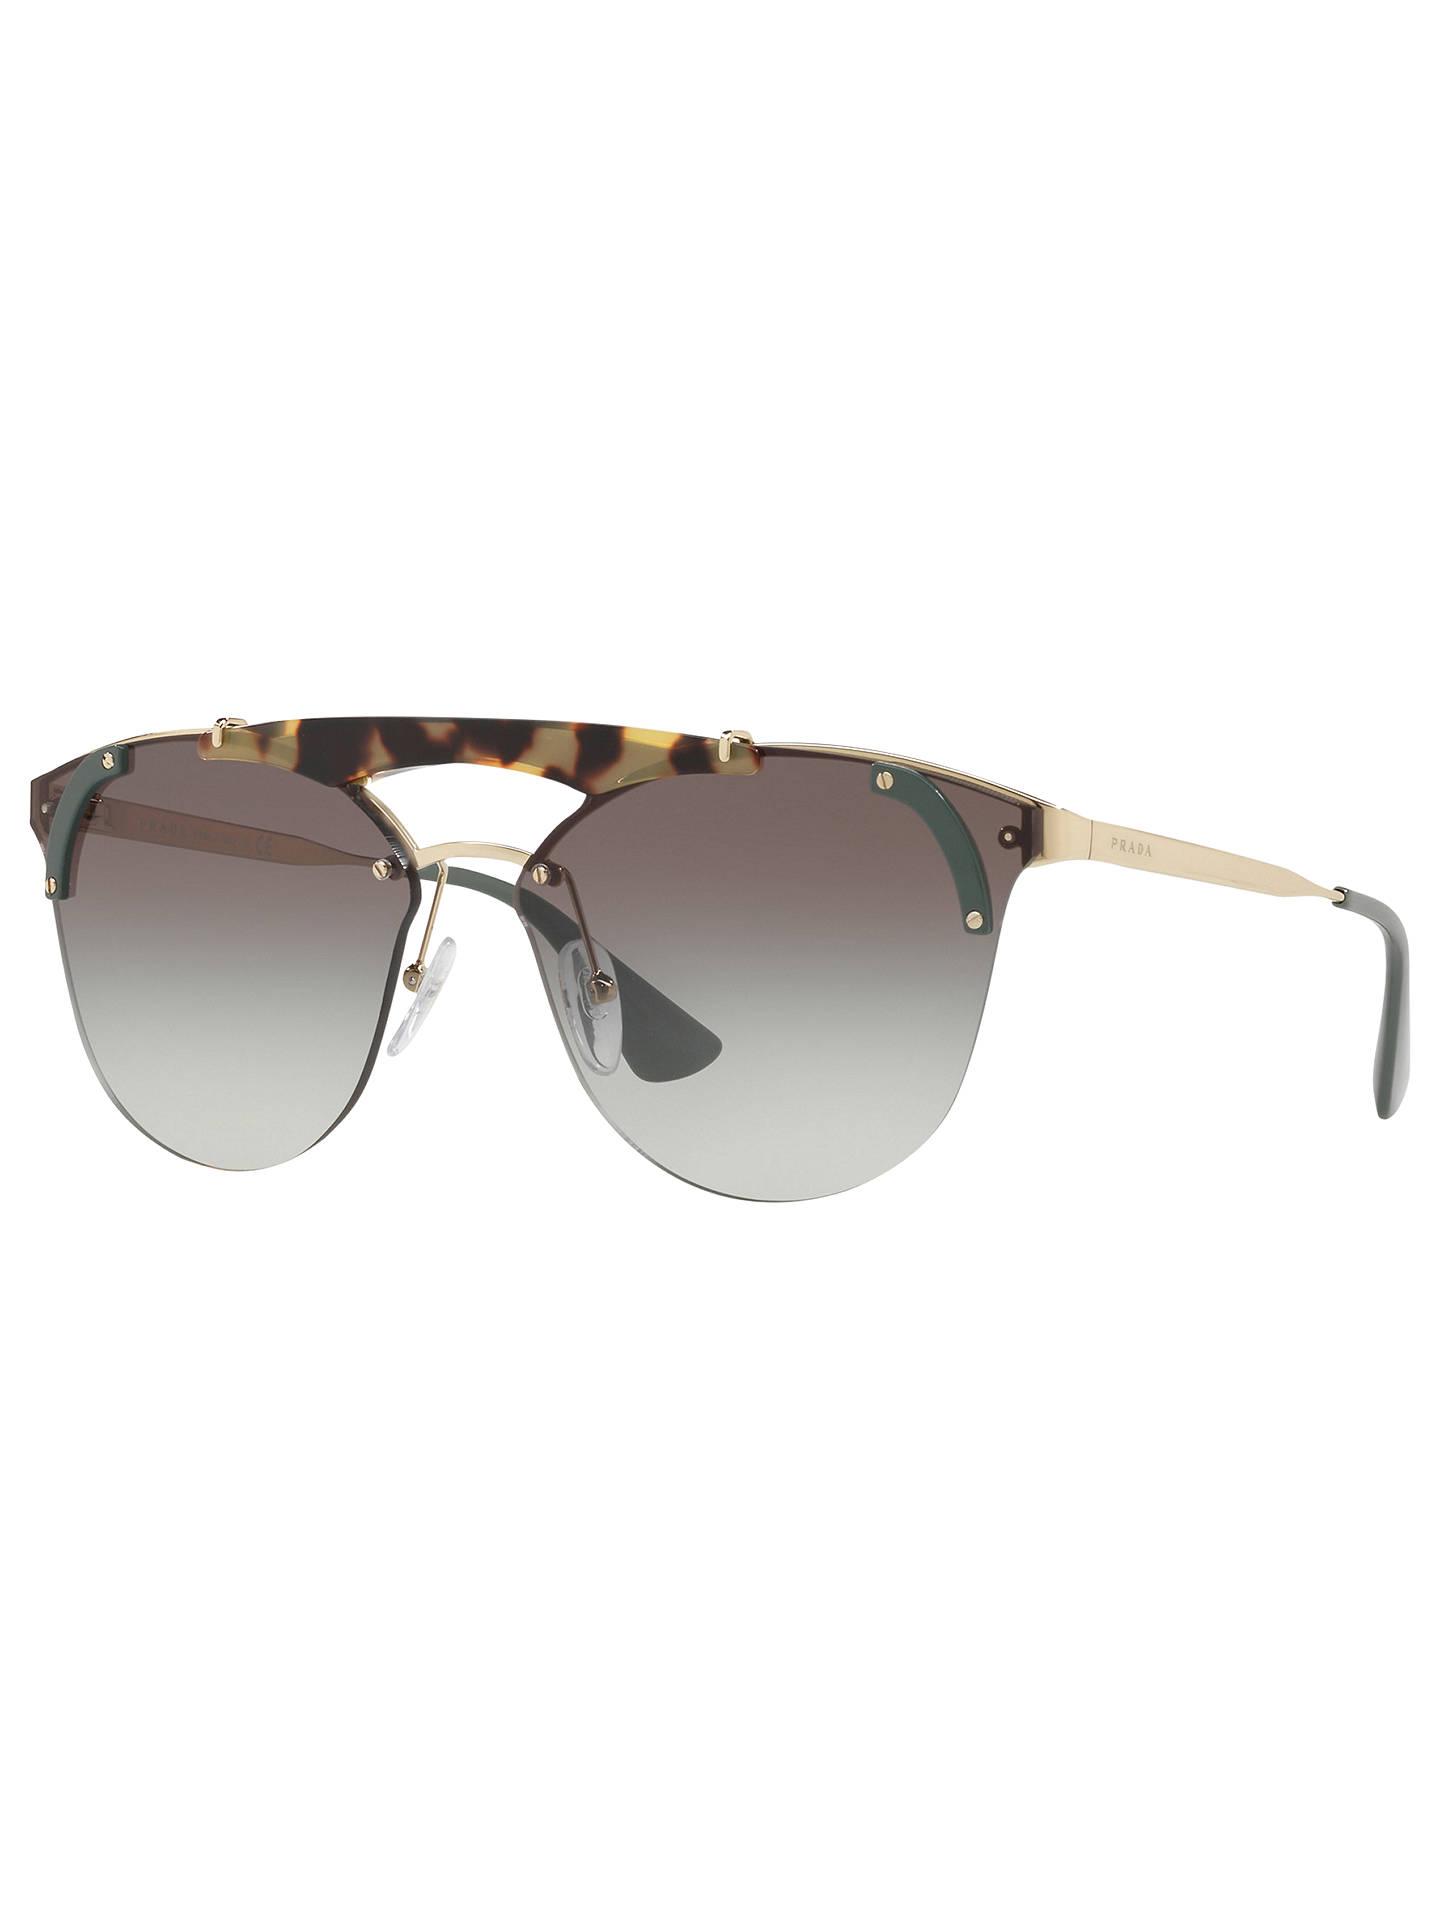 db9df35f3cc Prada PR 53US Round Sunglasses at John Lewis   Partners